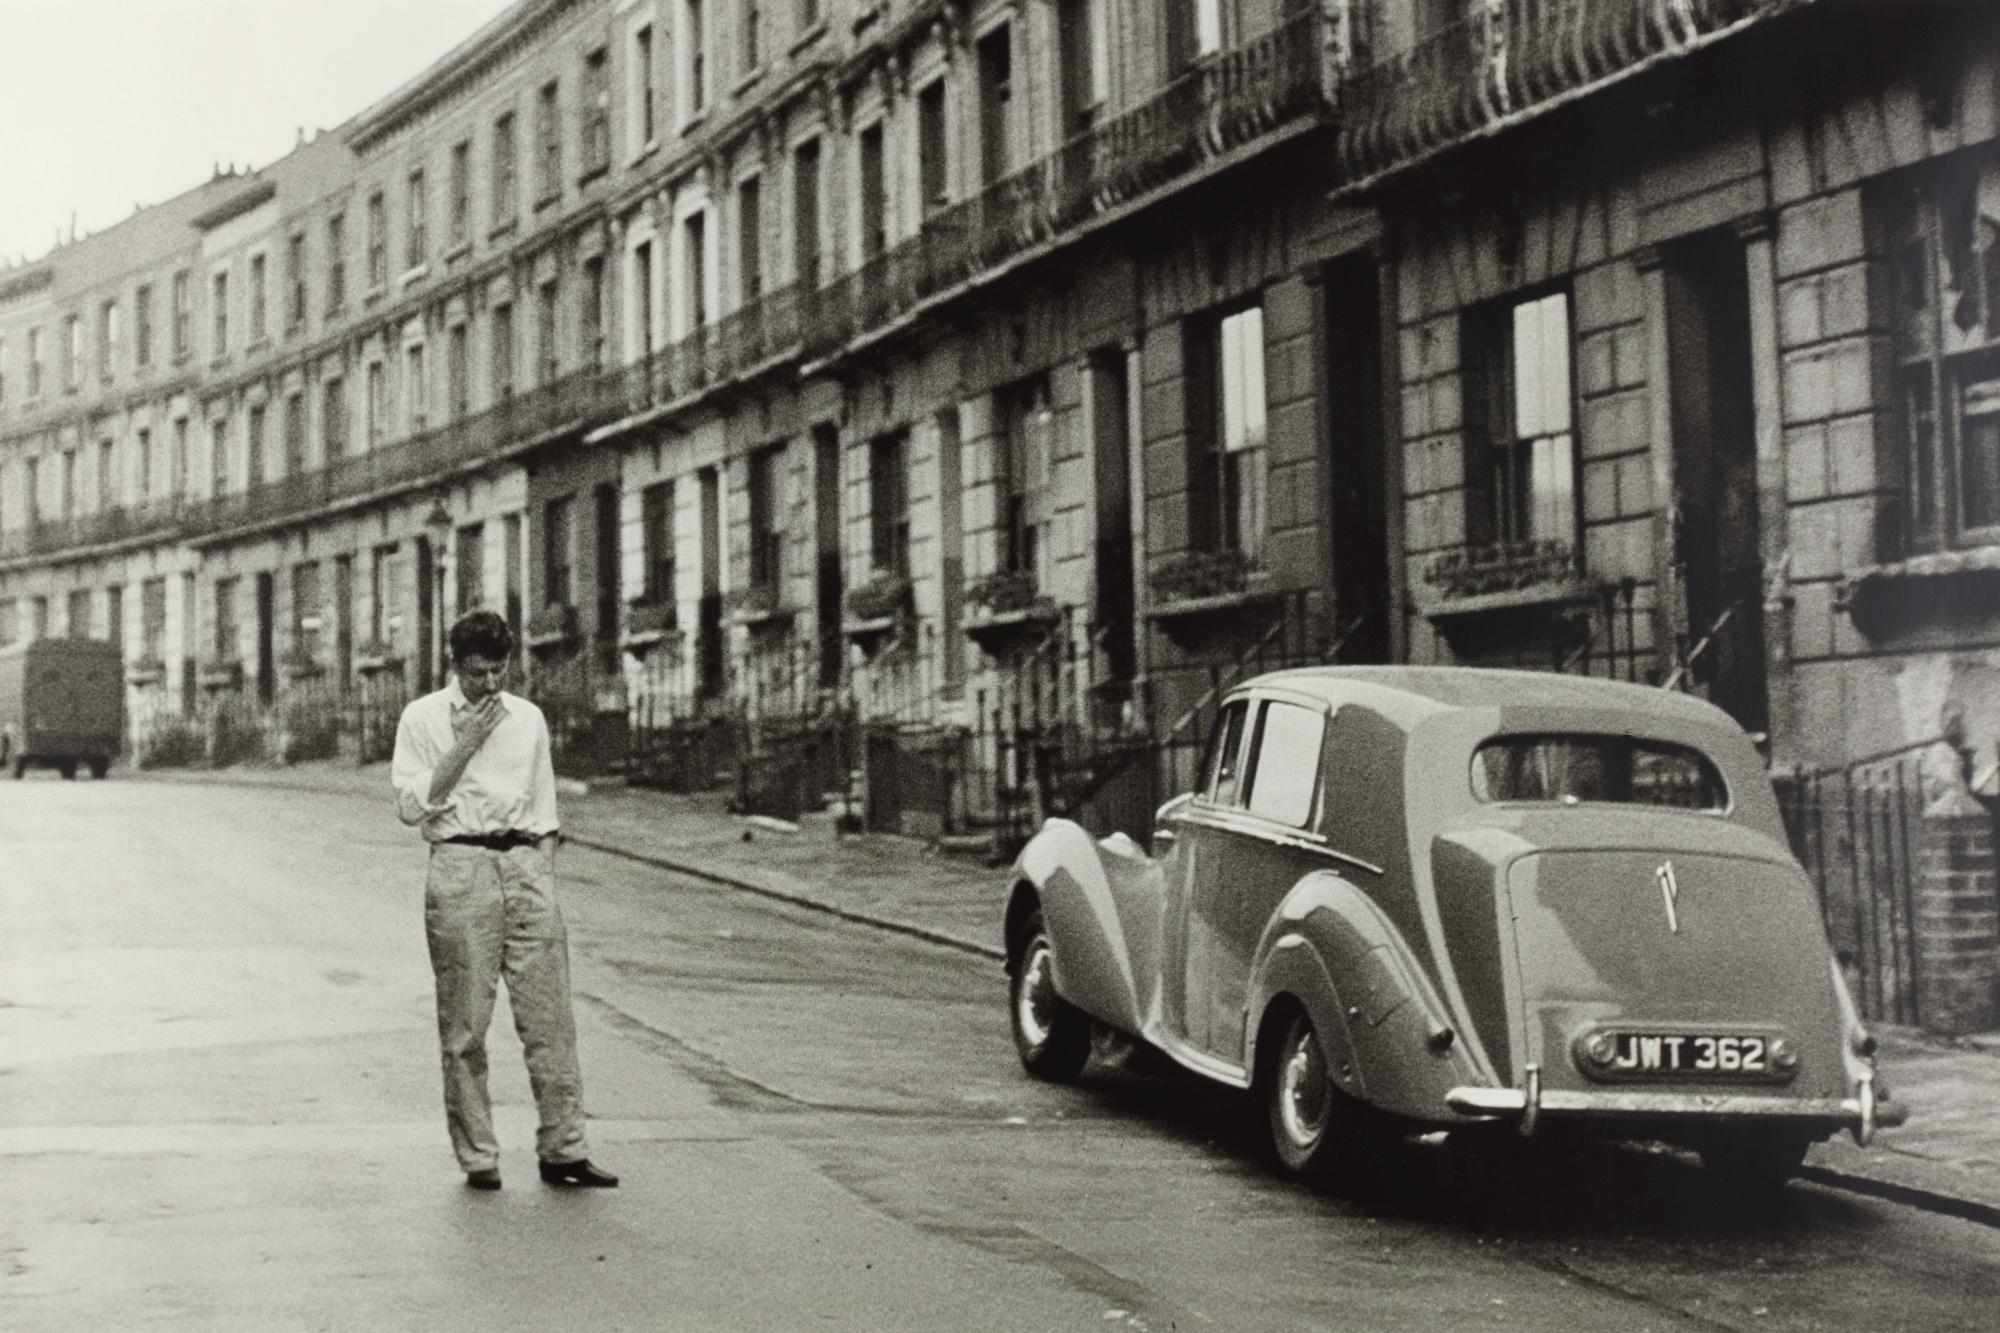 LORD SNOWDON | LUCIAN FREUD, PADDINGTON, LONDON, 1963